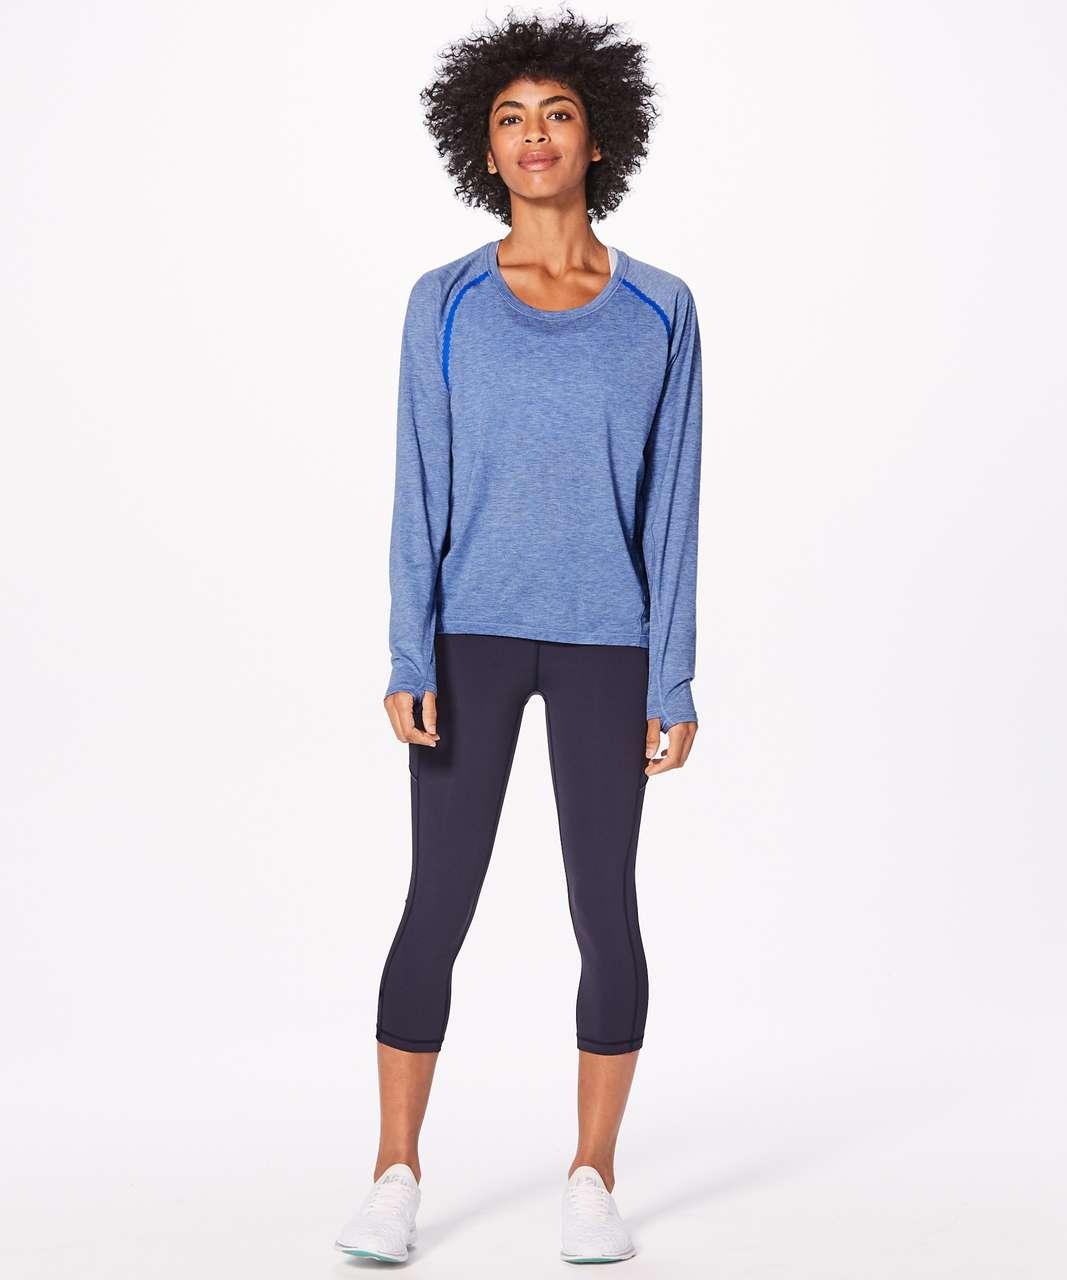 Lululemon Stop Drop & Squat Long Sleeve - Heathered Blazer Blue